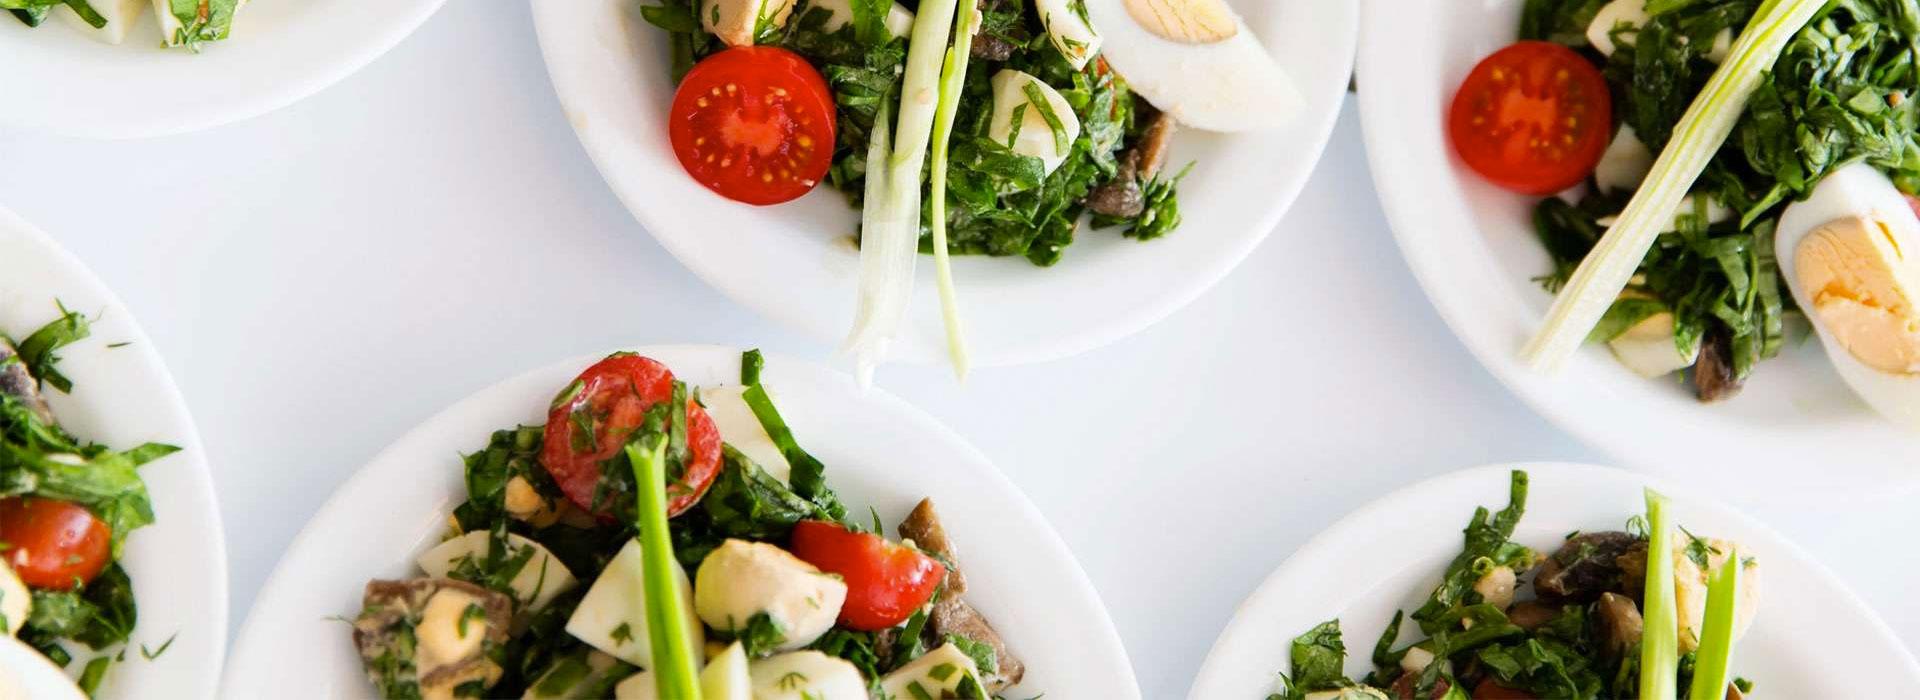 Laubster's Catering - Best Central Florida Caterer